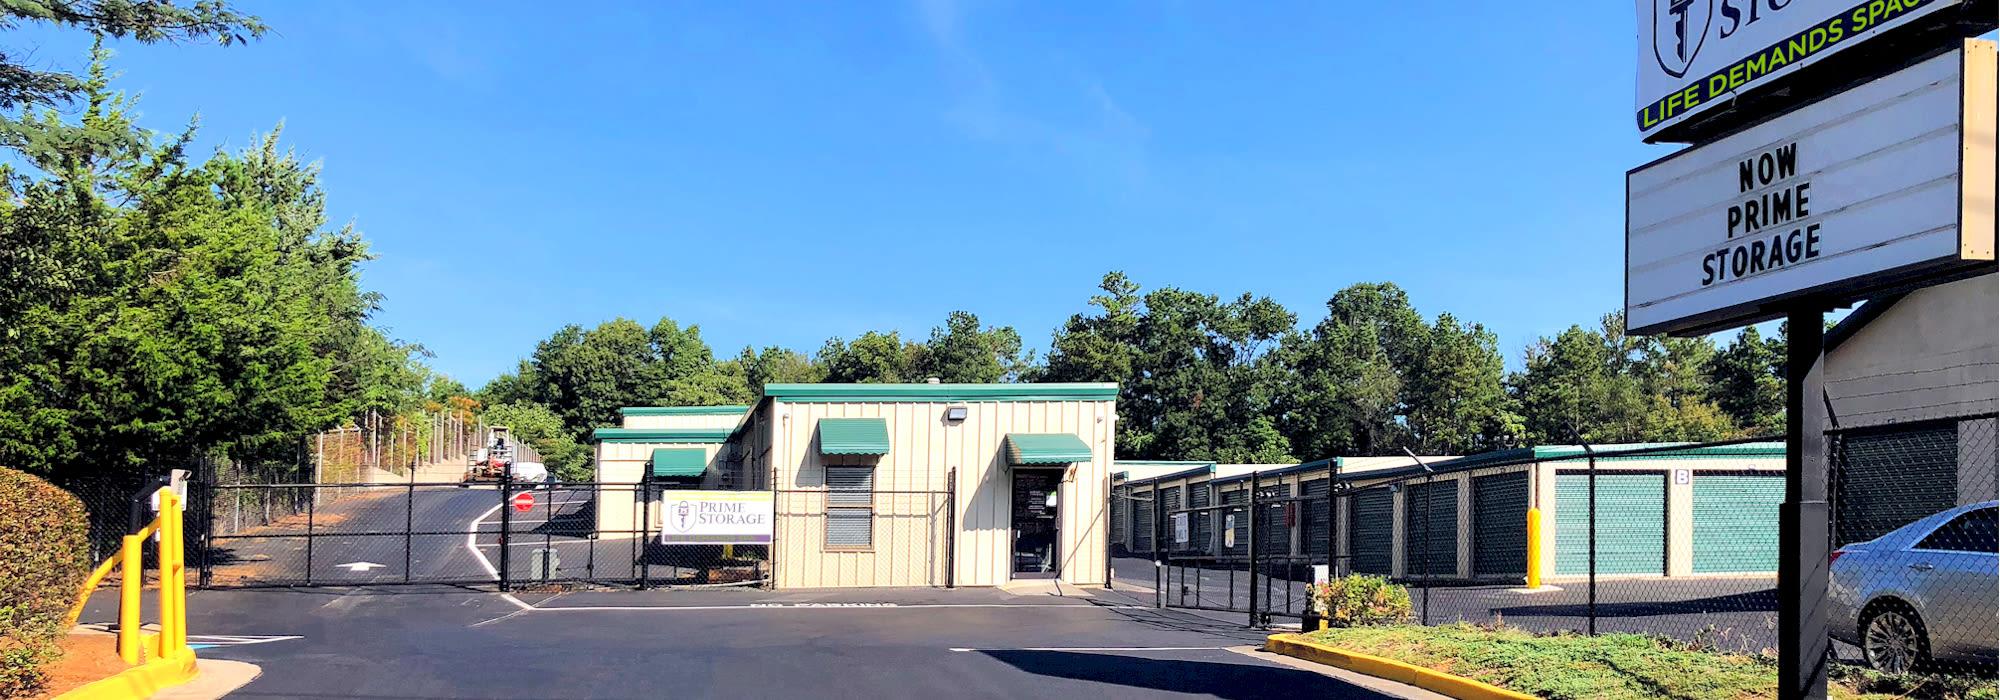 Prime Storage in Marietta, GA